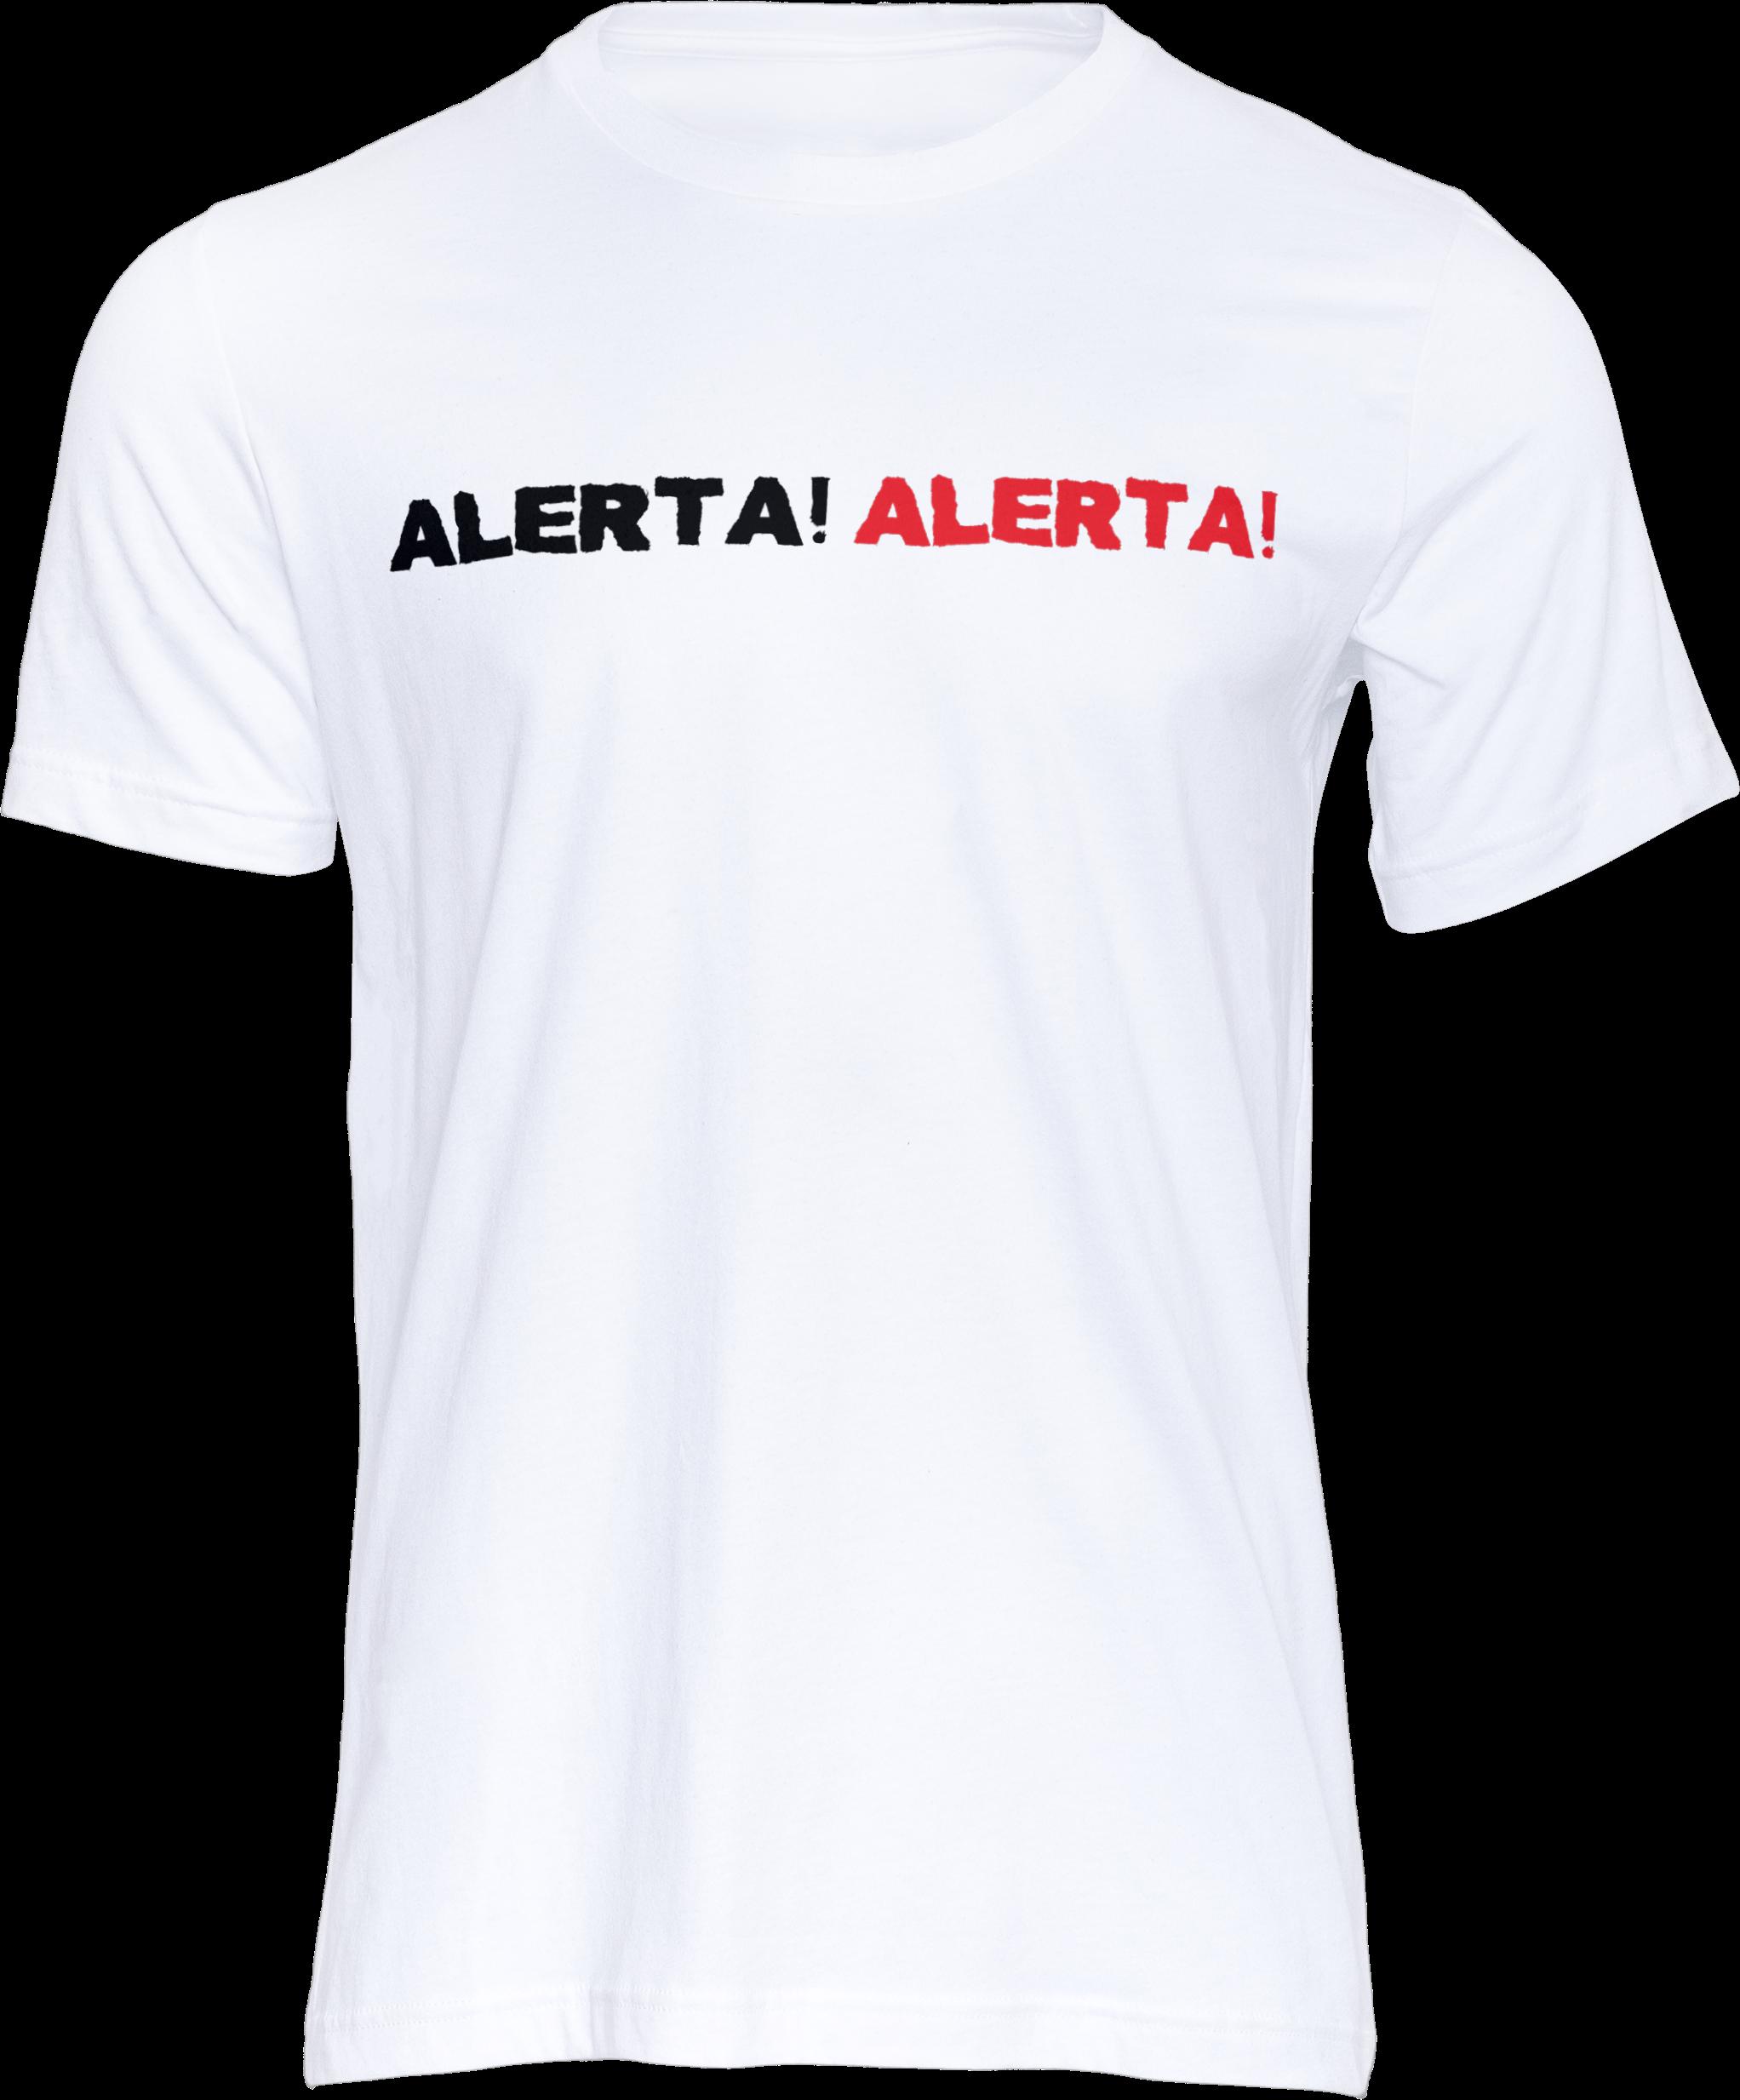 Motiv-Shirt – Alerta Alerta – T-Shirt (weiß)